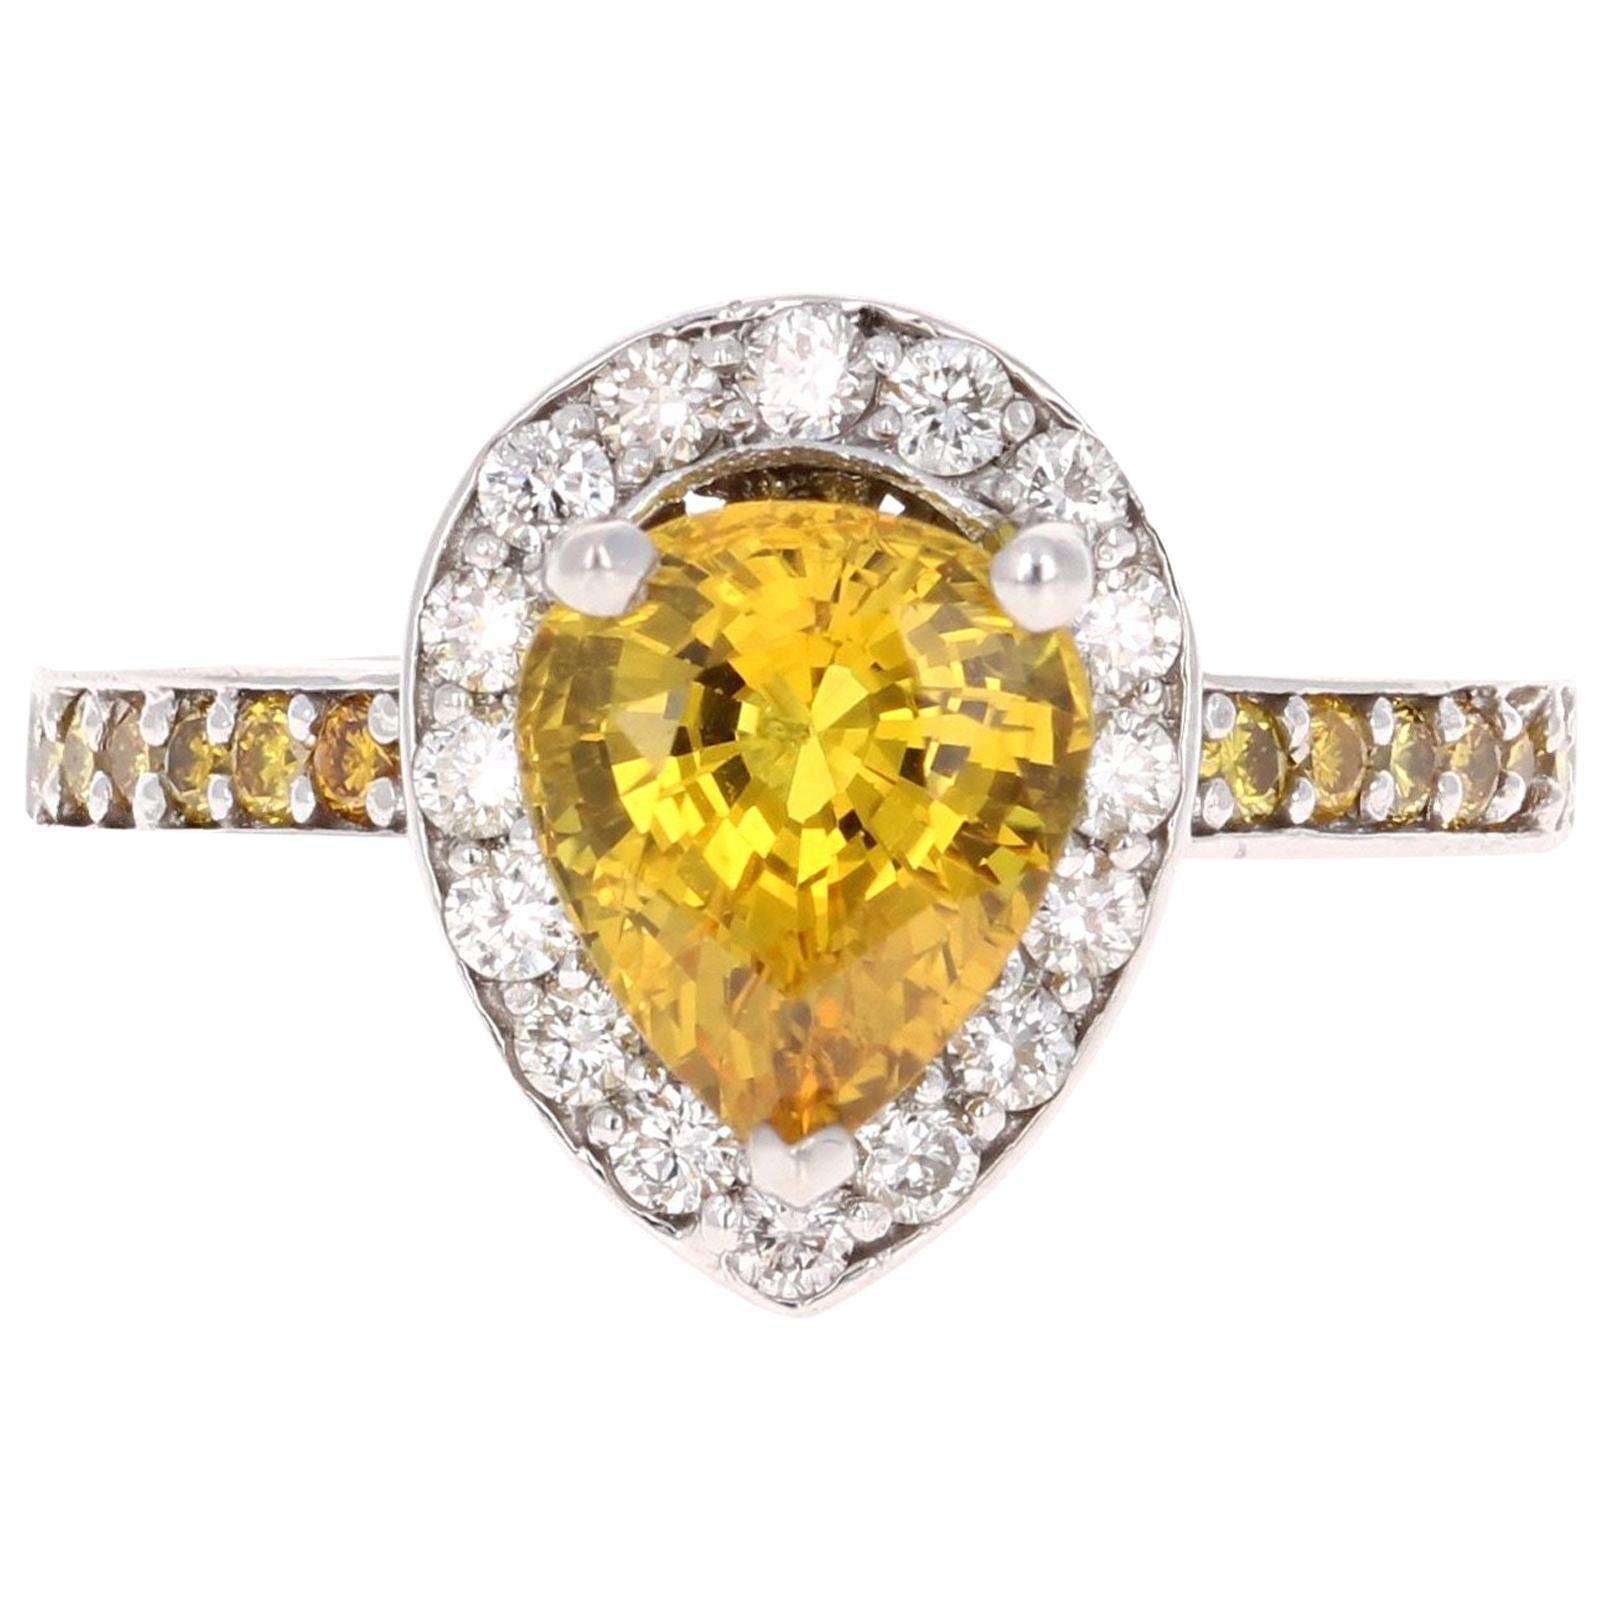 3.29 Carat Yellow Sapphire Diamond White Gold Engagement Ring